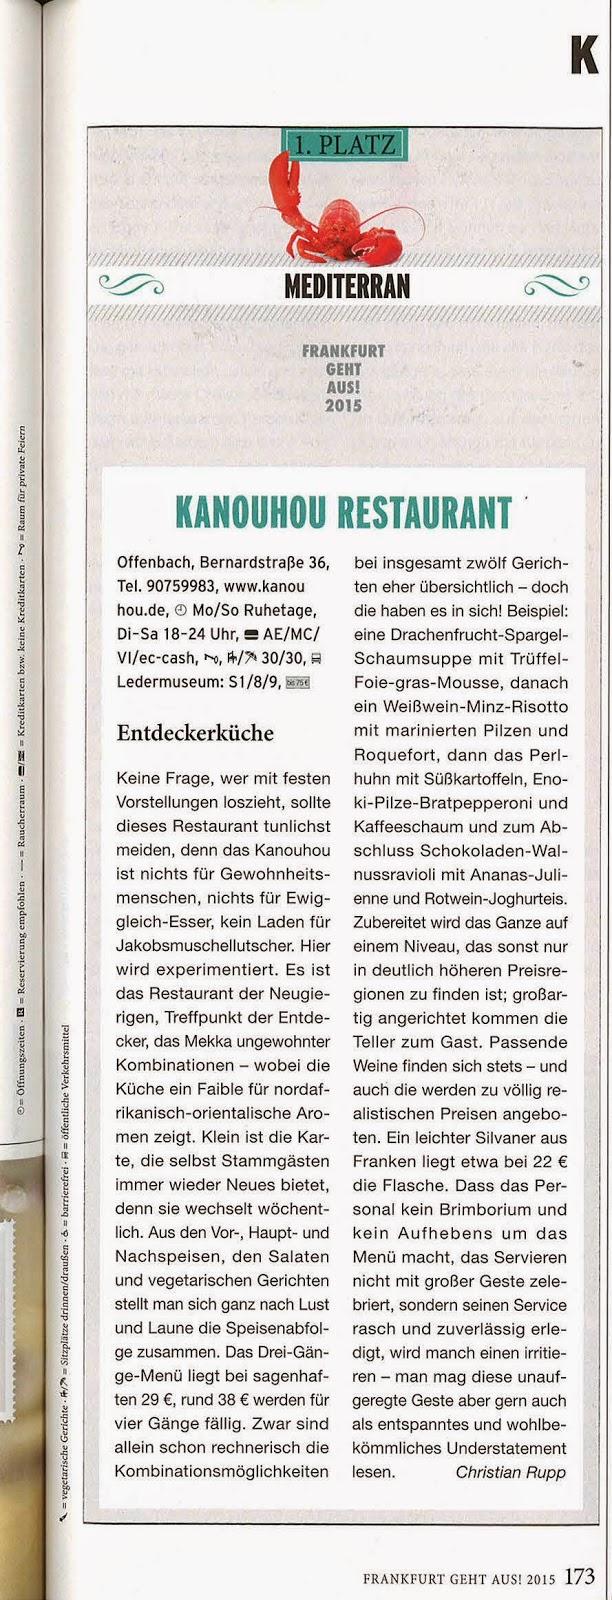 http://www.etage3.com/_kanouhou/FrankfurtGehtAus_2015_Kanouhou.pdf